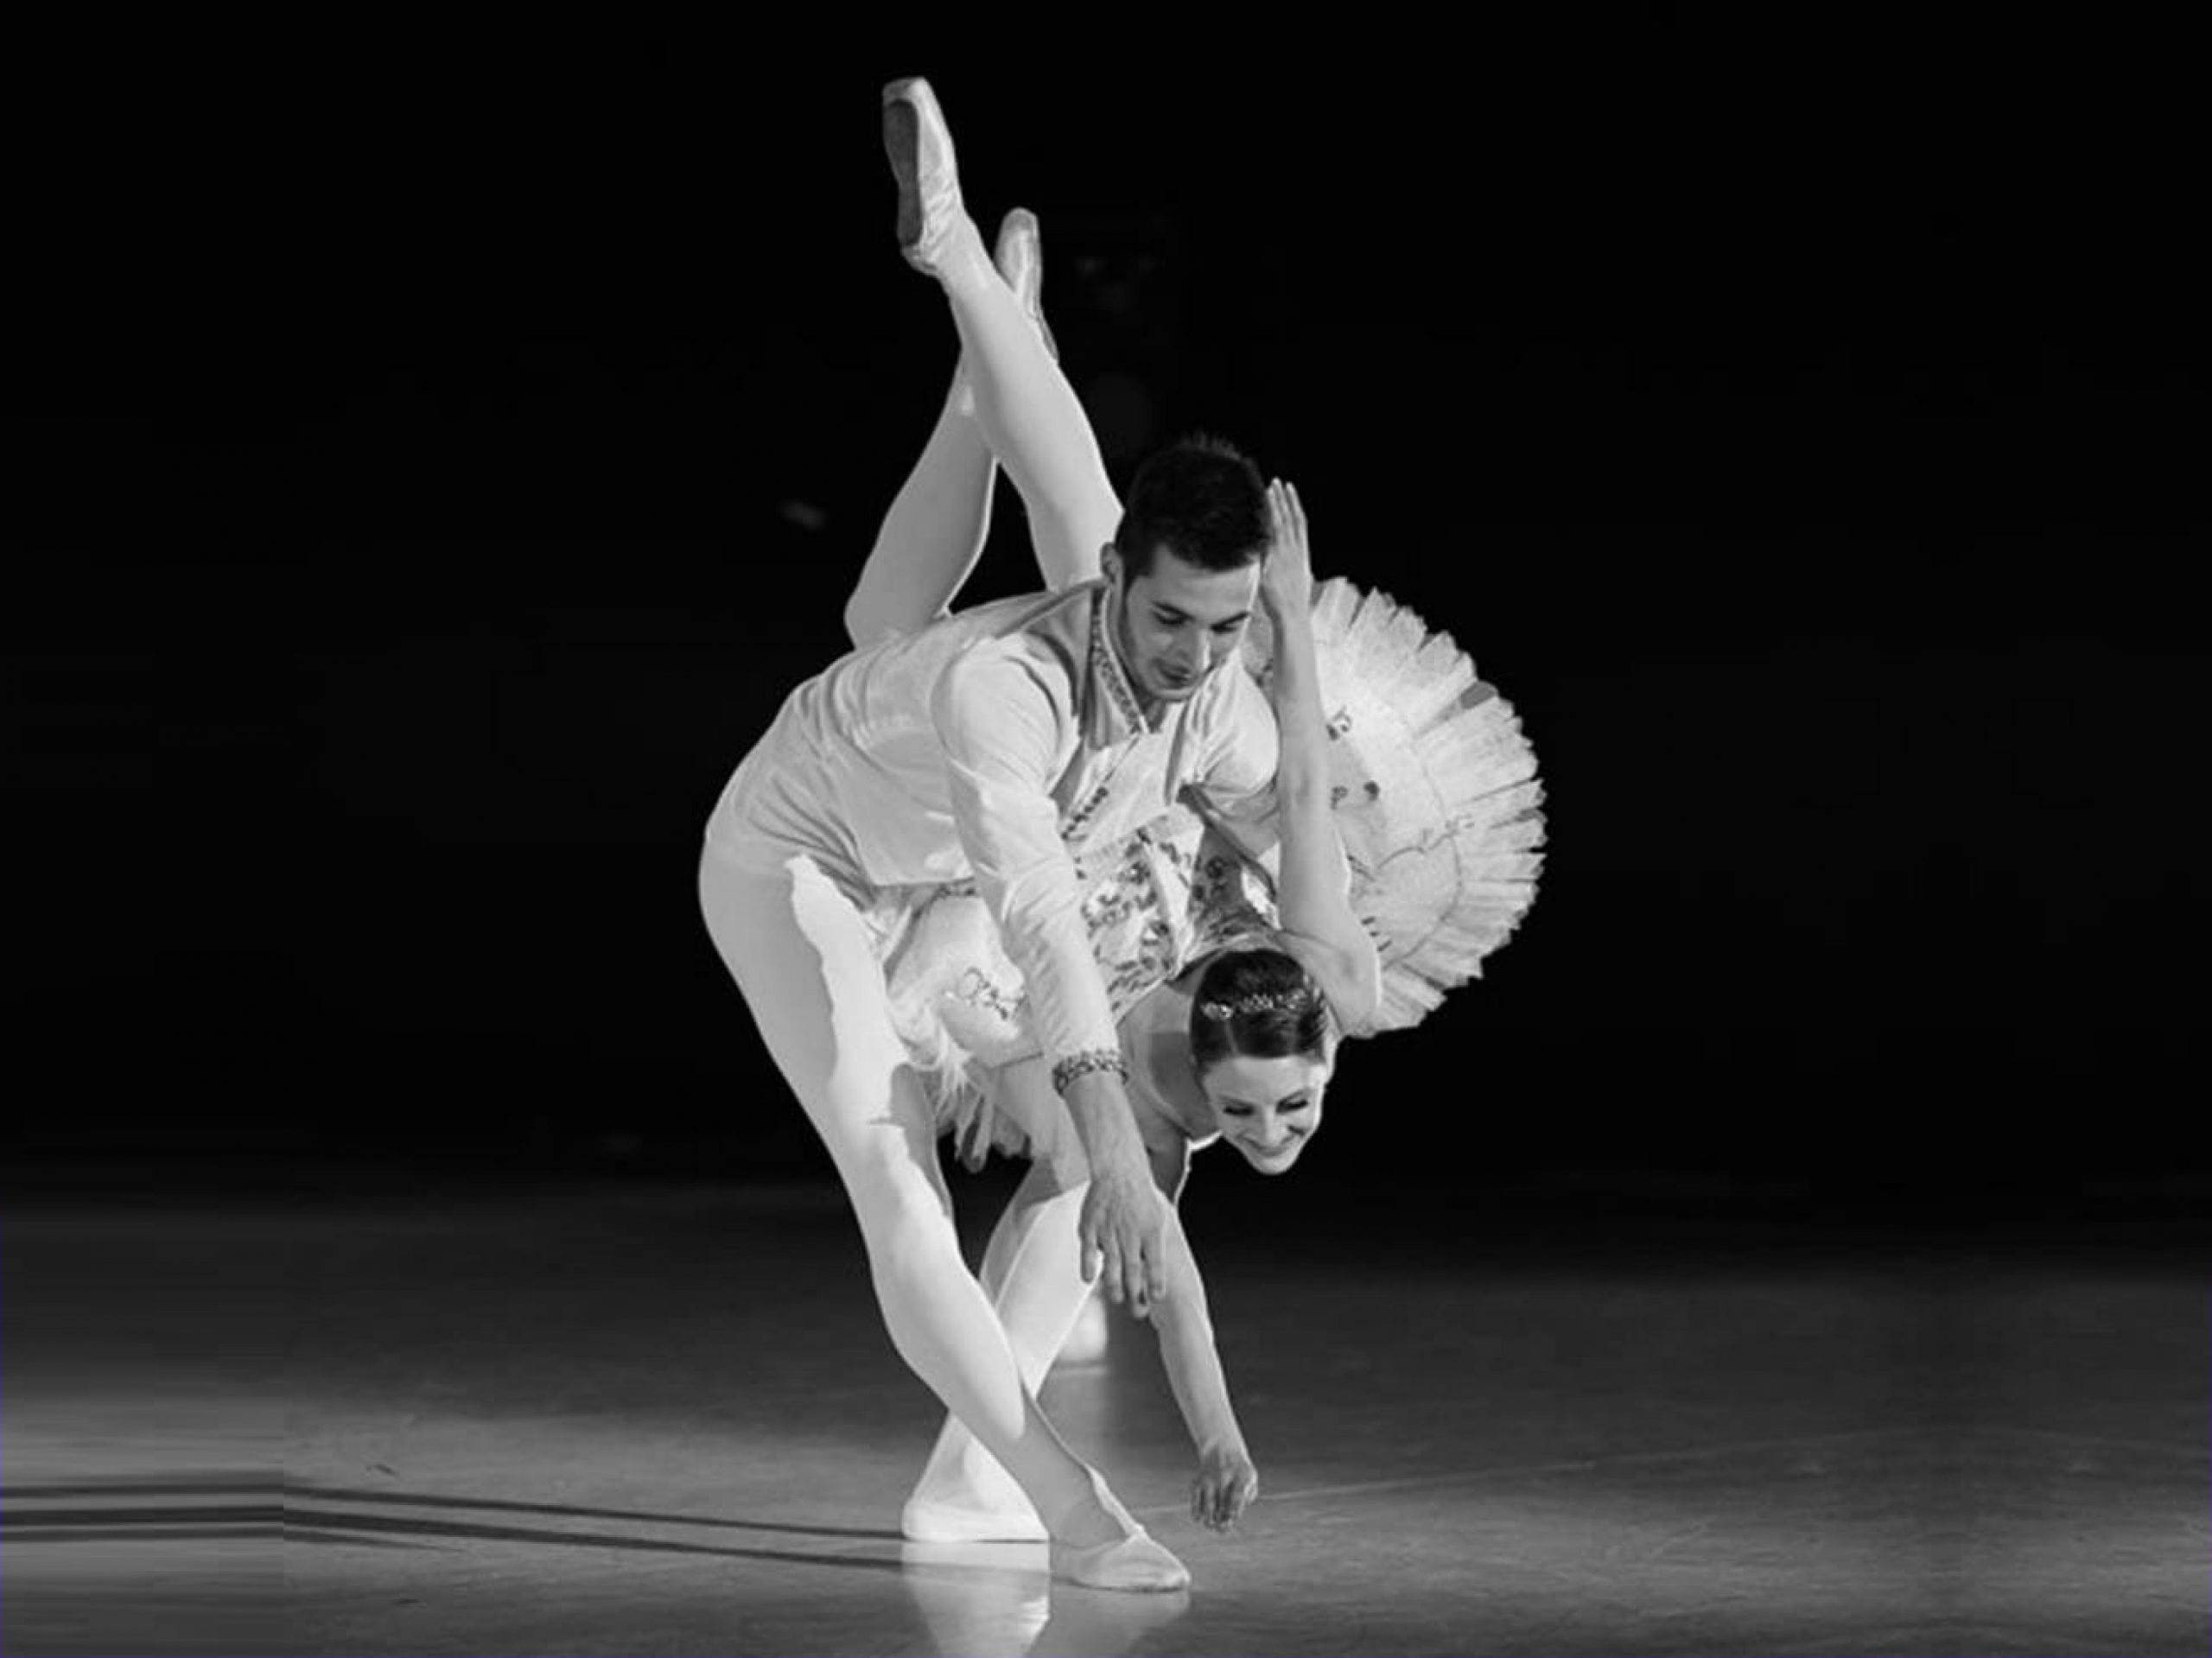 Company V Balletschool Veronique lenaers_ slider 12